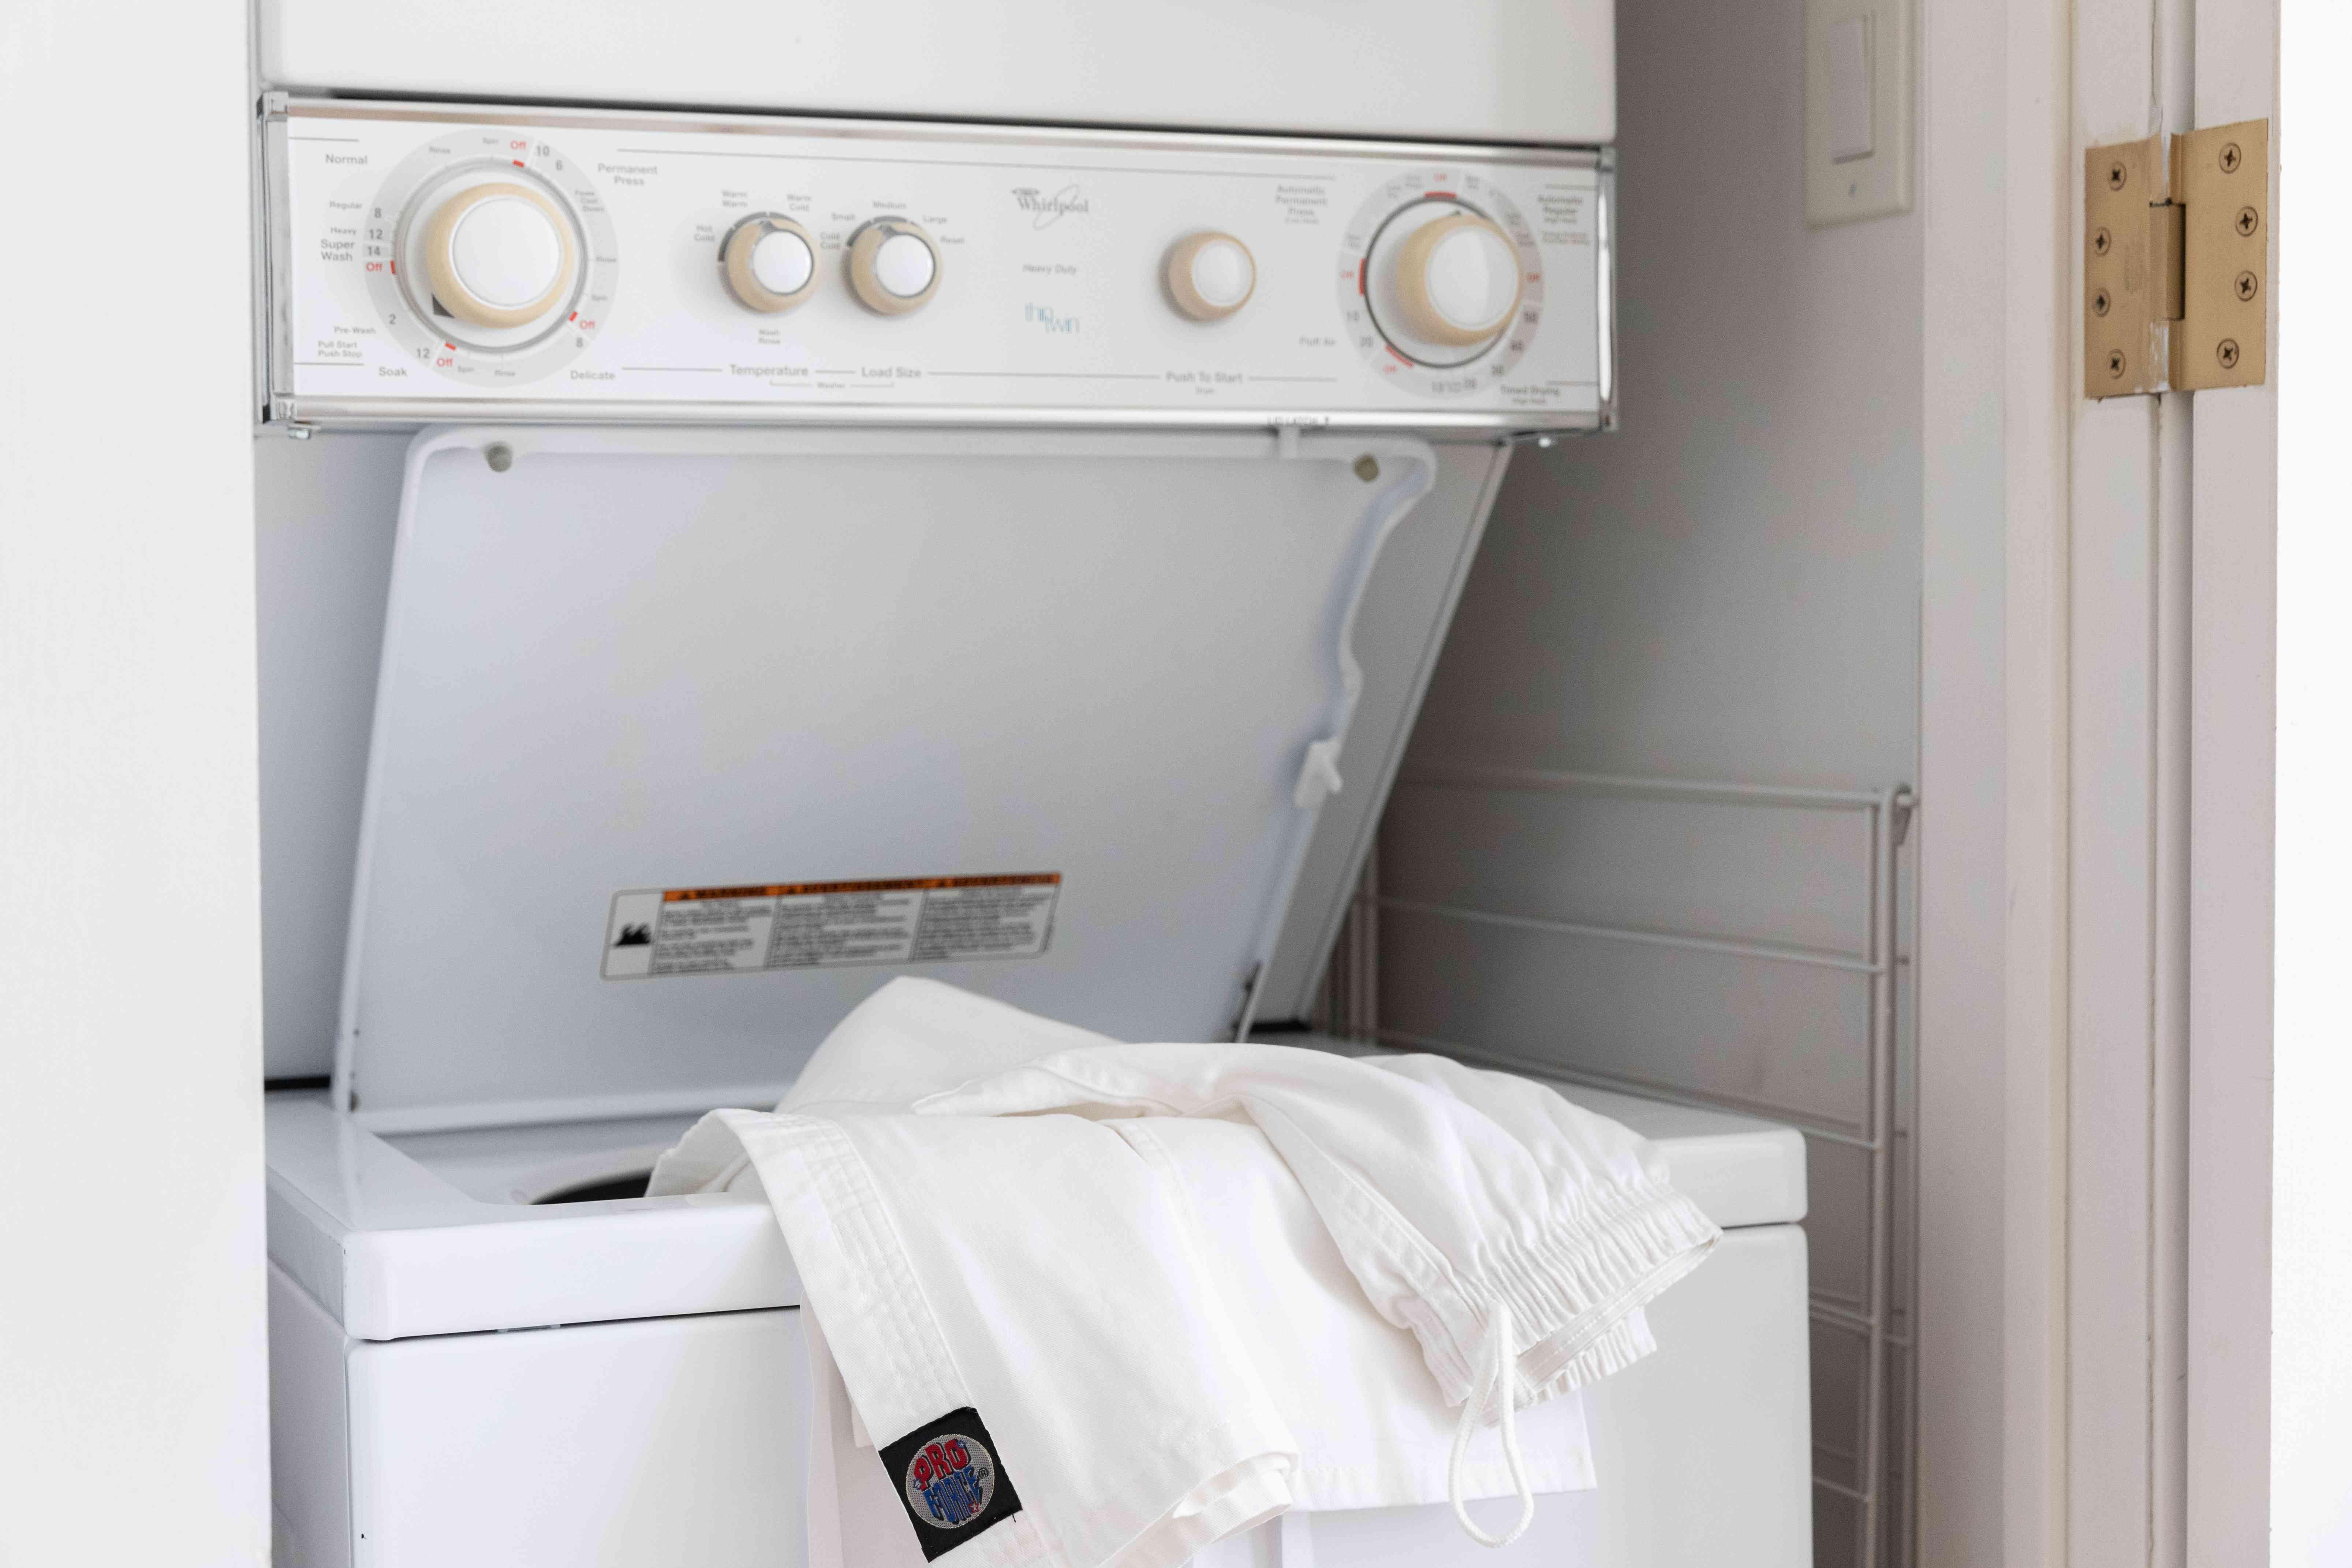 Karate uniform hanging off edge of open washing machine